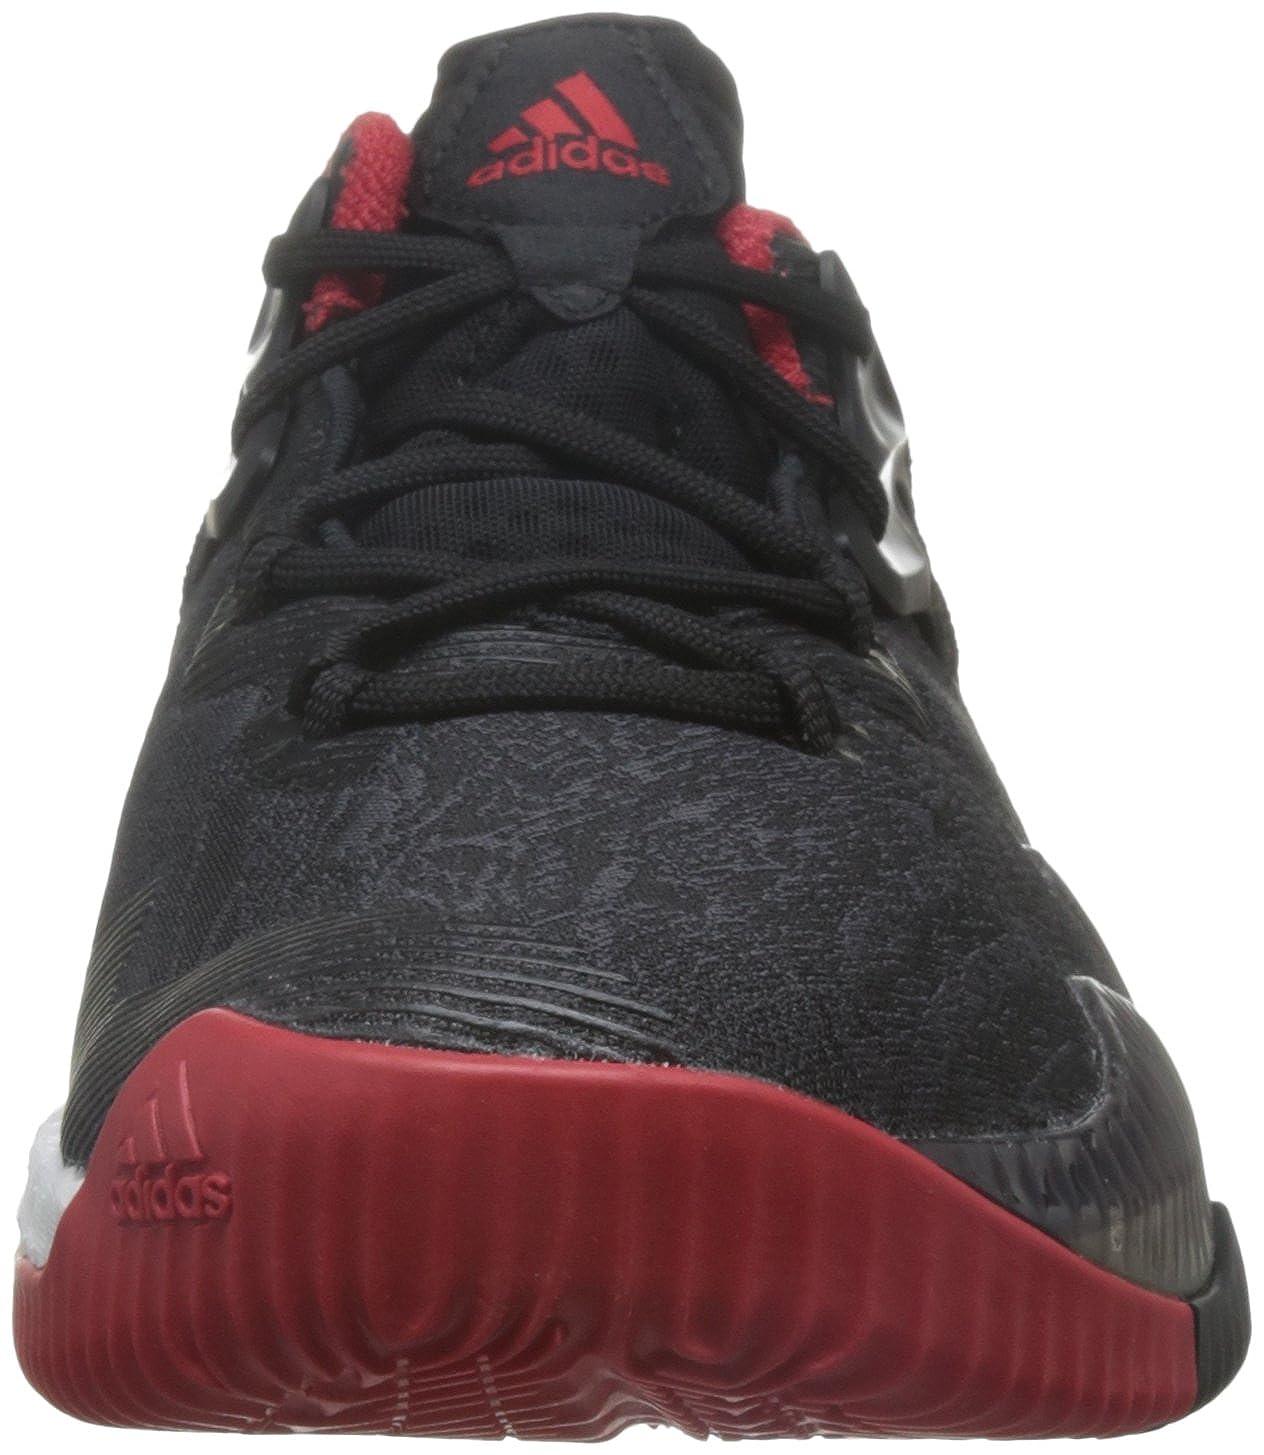 premium selection ba204 01dcd Adidas Crazylight Boost Lo, Scarpe da Basket Uomo B01FFBXZ7S 42 42 42 2 3  EU MultiColoreeee ...